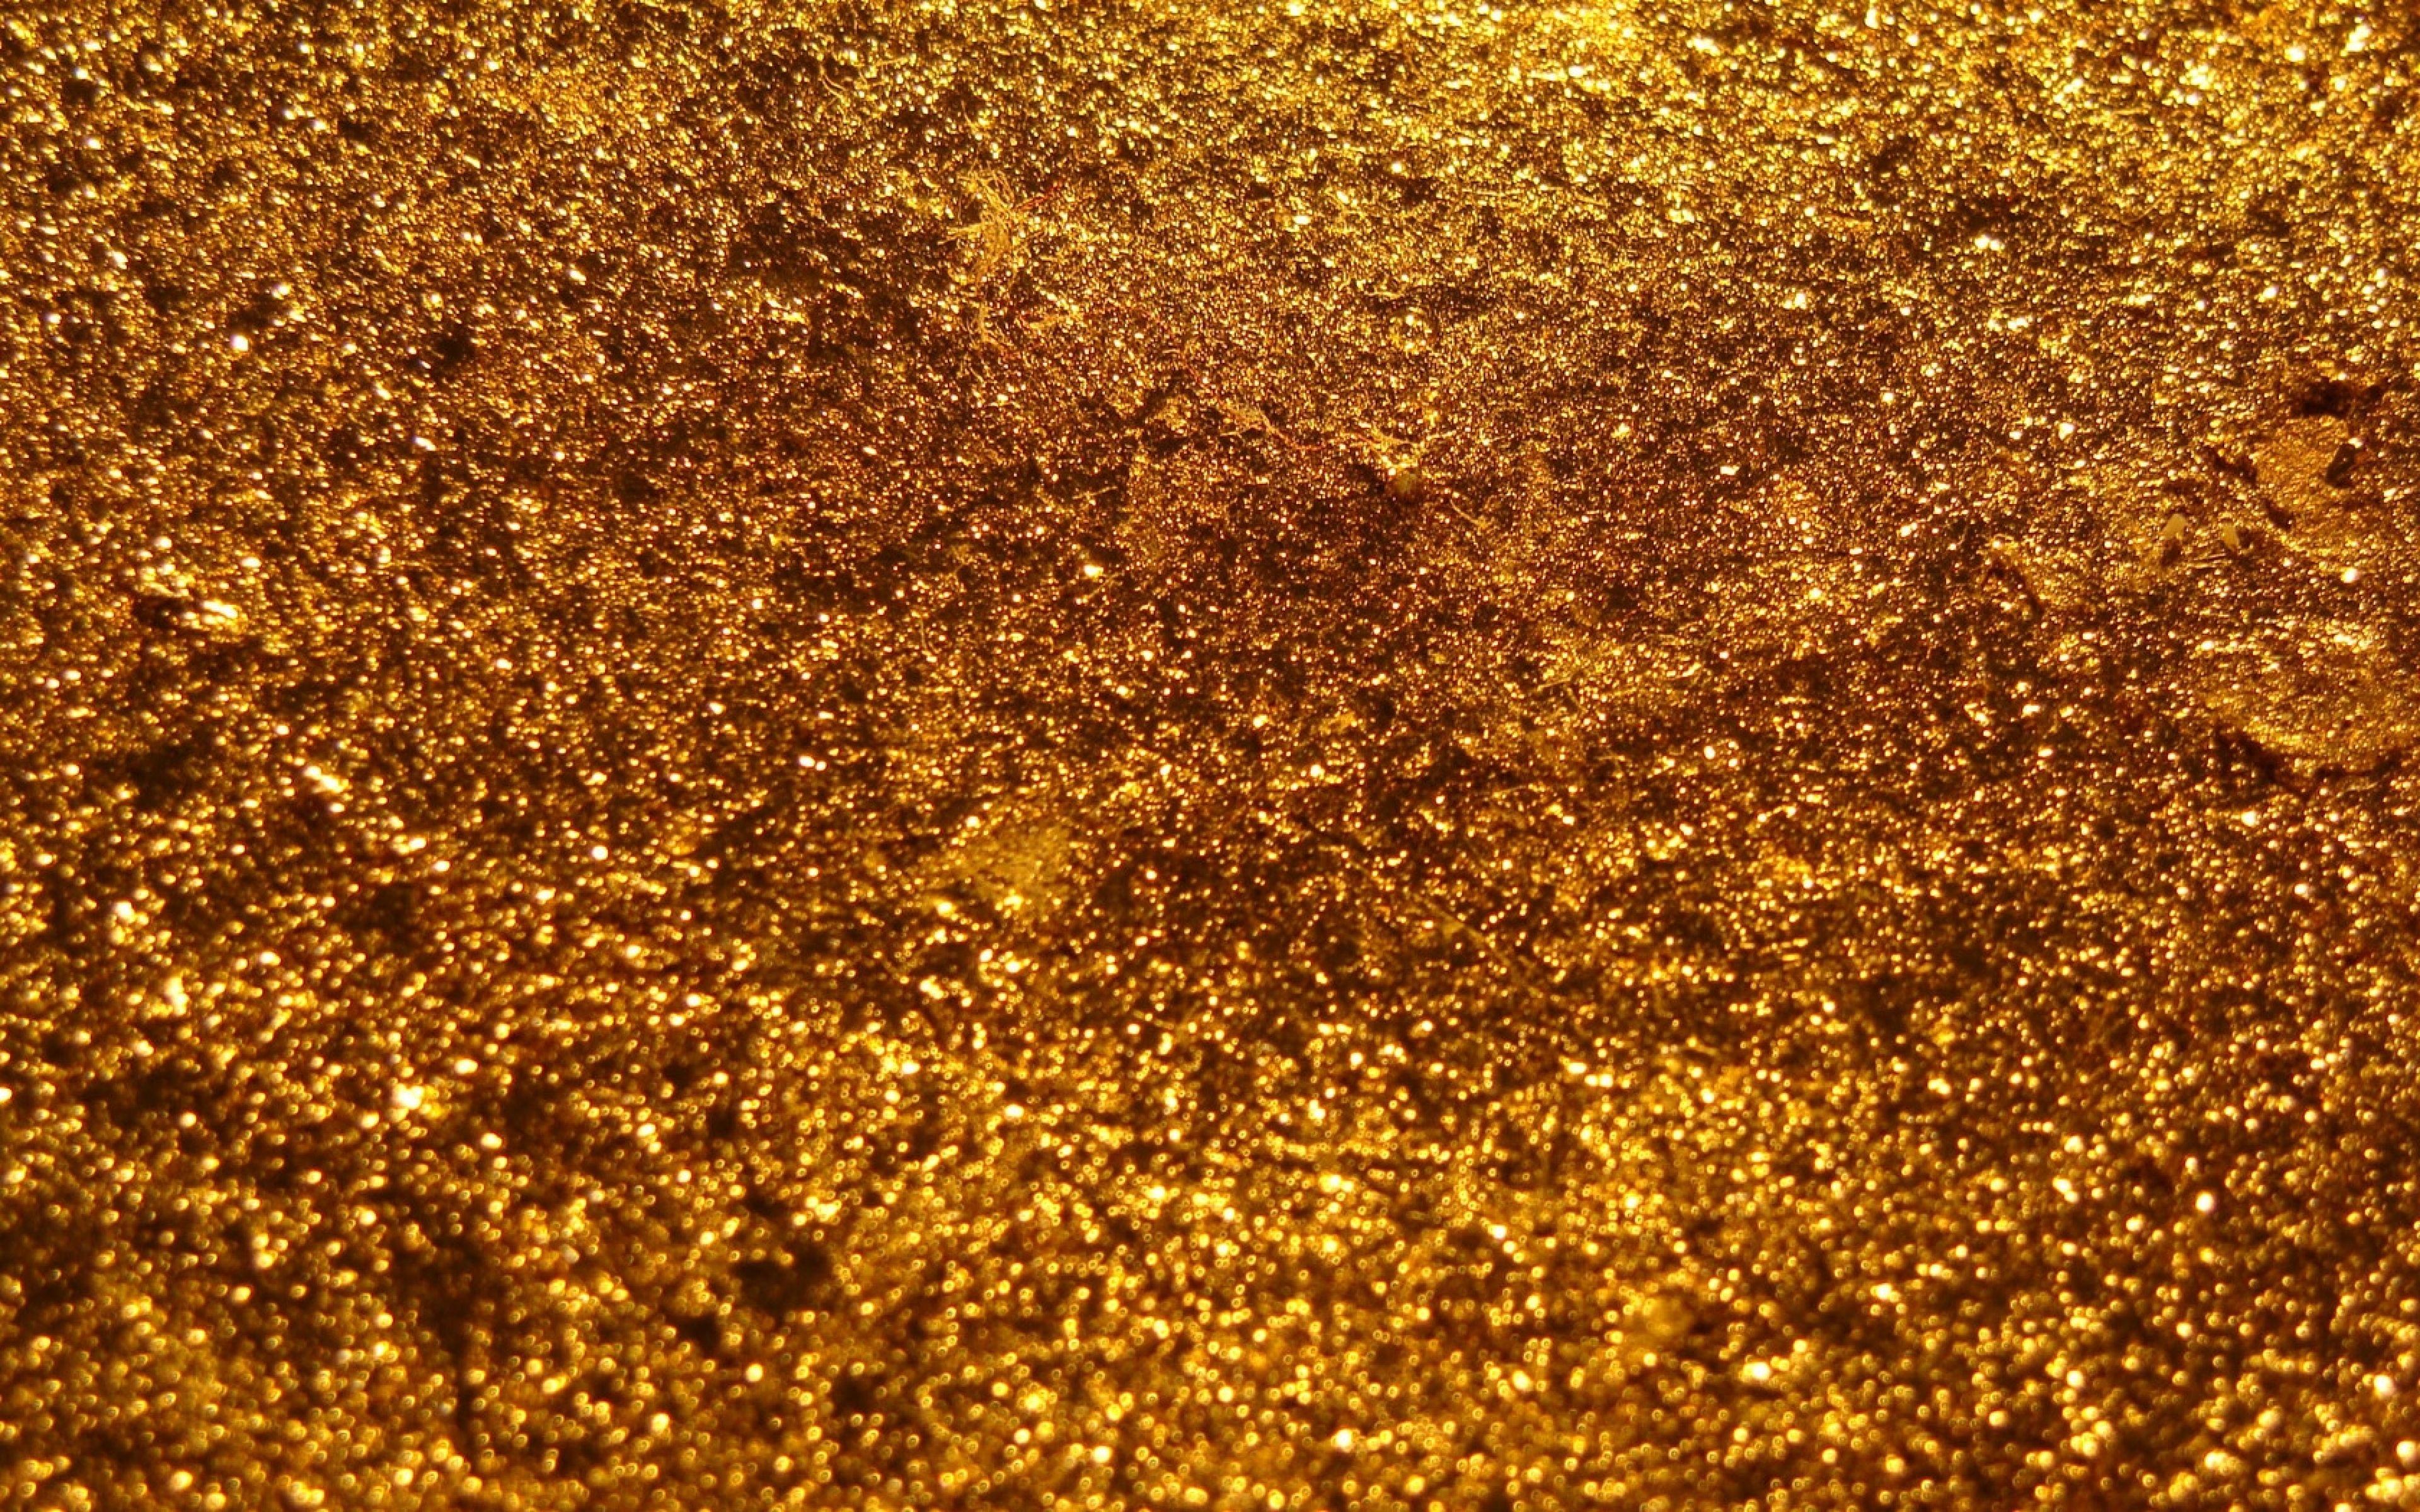 Diamond Iphone Wallpaper Hd Ultra Hd 4k Gold Wallpapers Hd Desktop Backgrounds